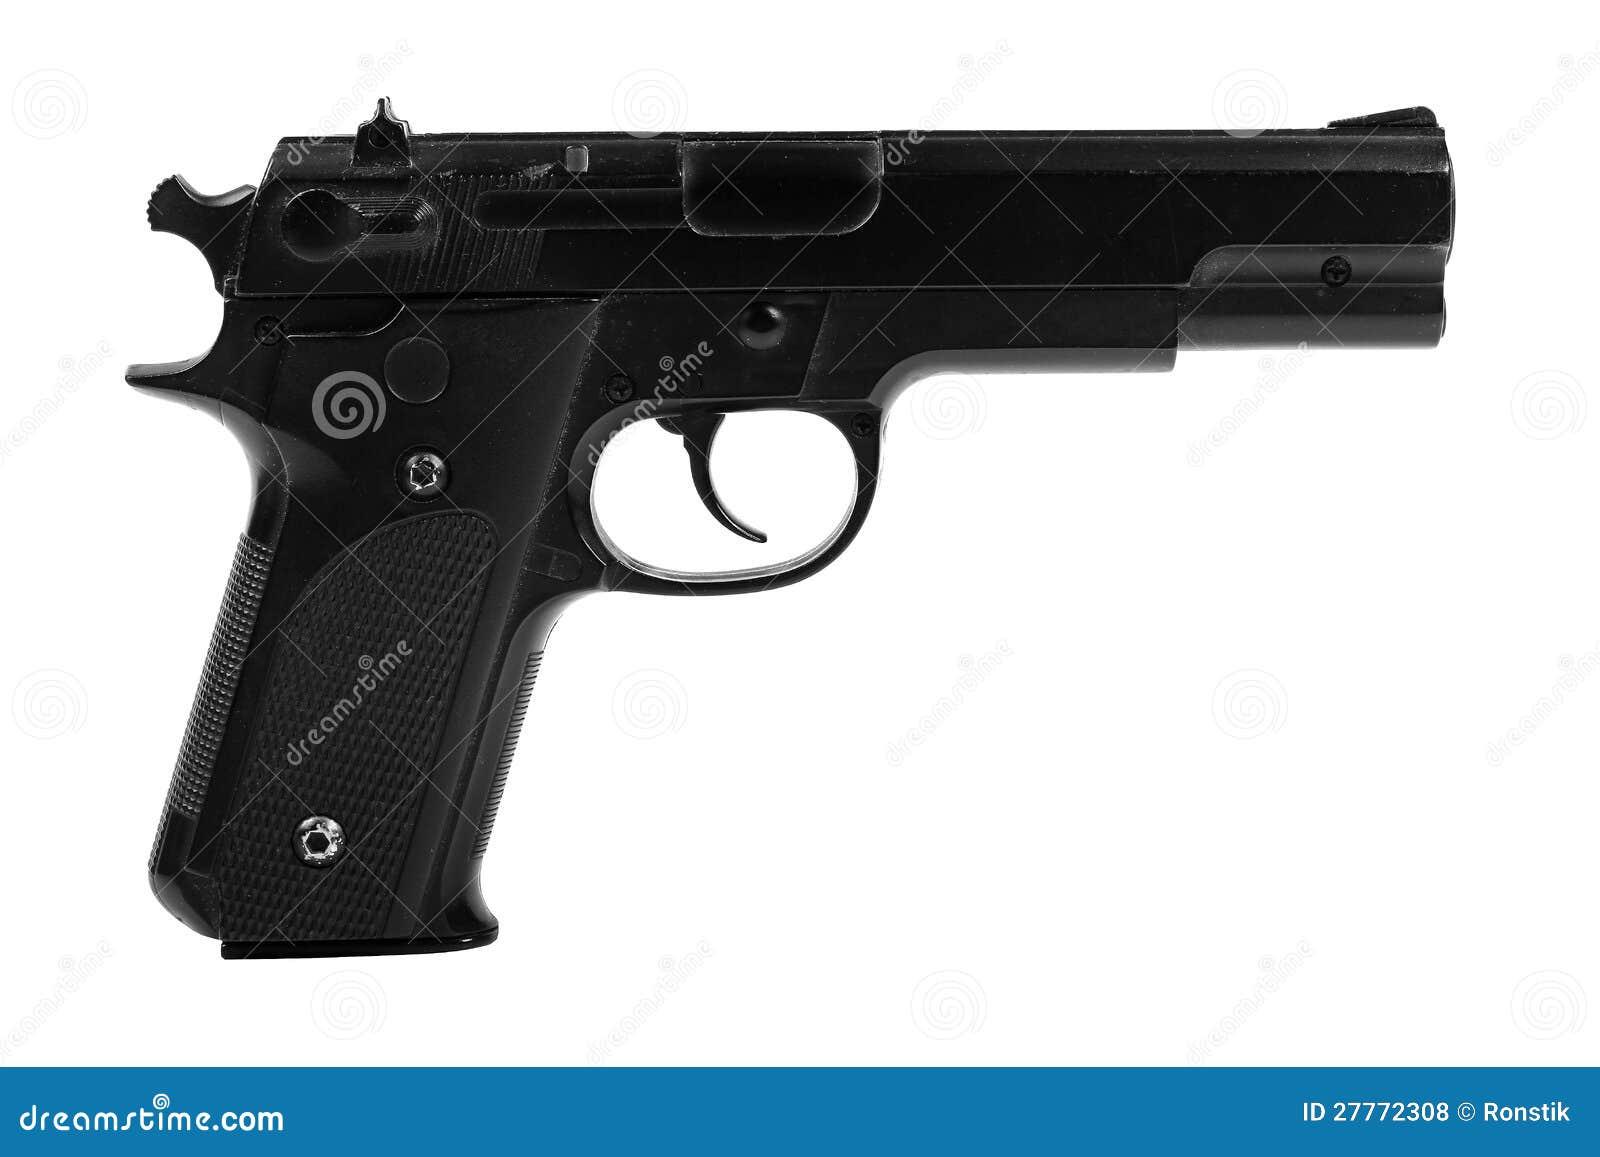 gun white background - photo #5